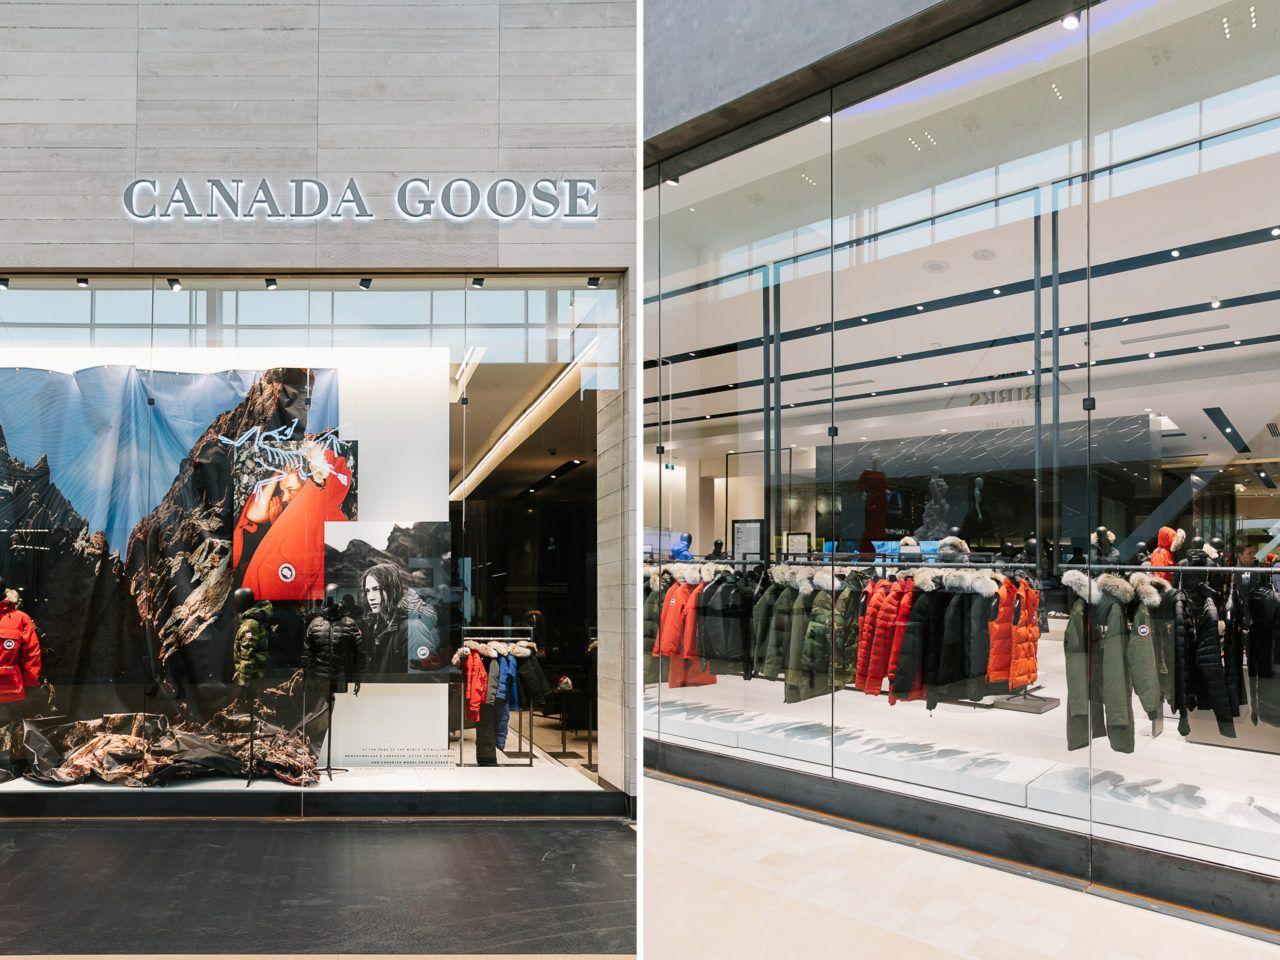 Canada Goose Global Flagship Ania B Canada Goose Canada Canada Goose Store